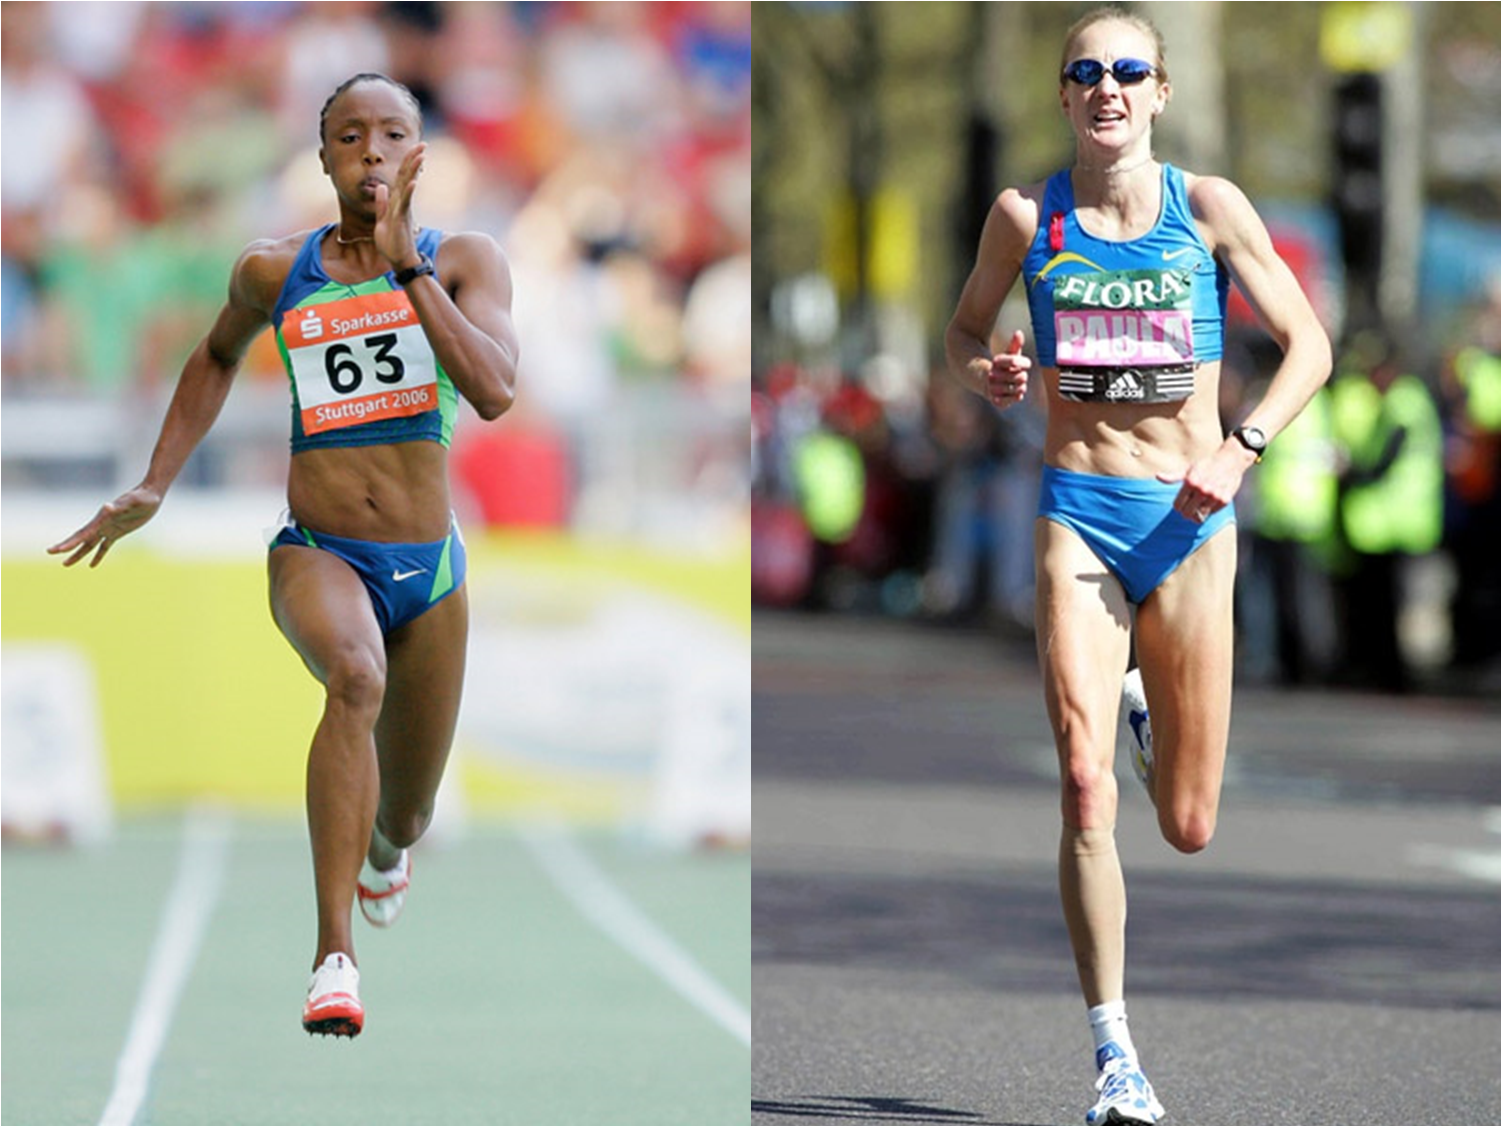 Sprinters physique